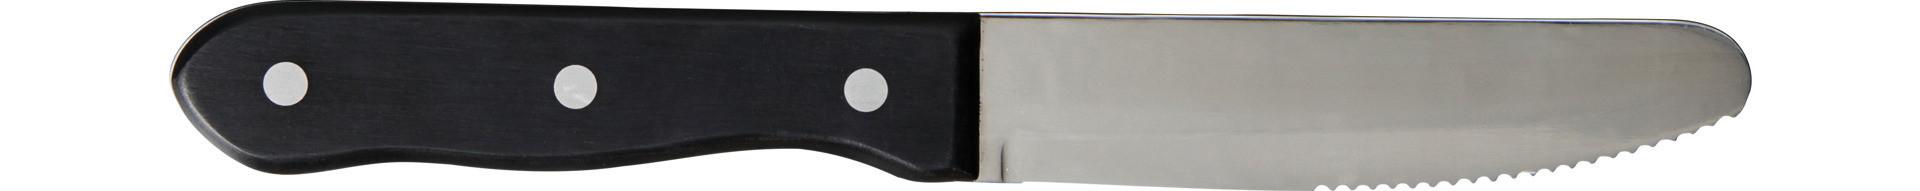 Varick Steak Knives, Steakmesser 250 mm Kunststoffgriff